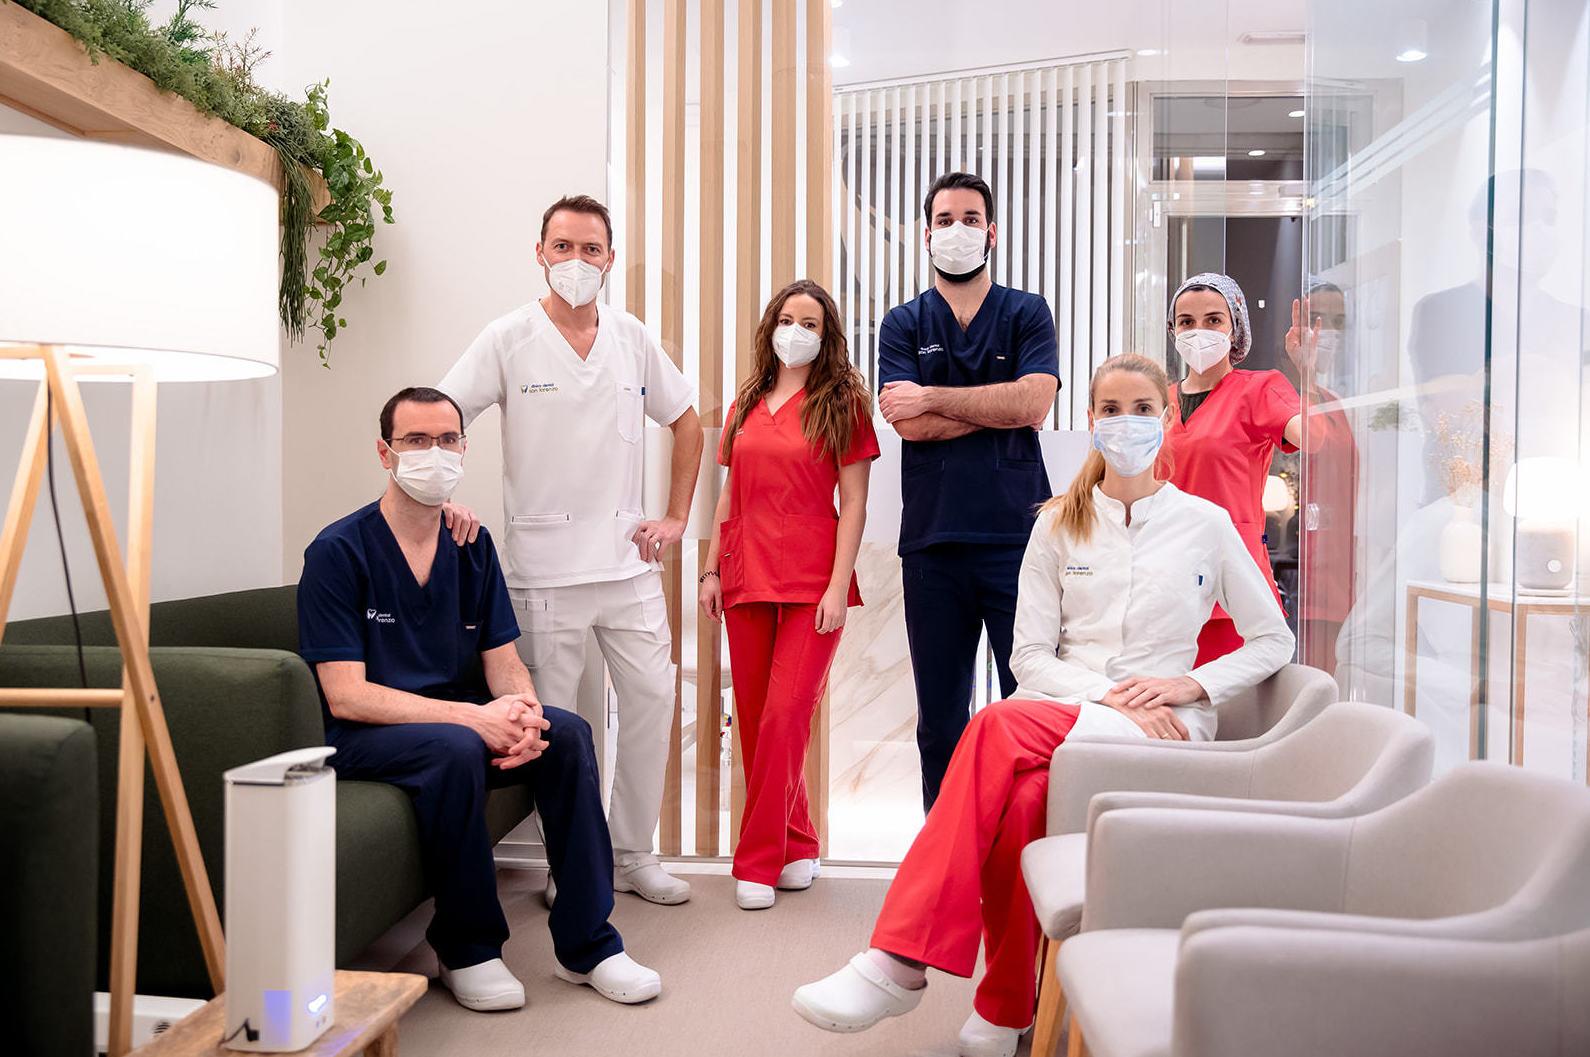 Foto 12 de Clínicas dentales en Zaragoza | Clínica Dental San Lorenzo